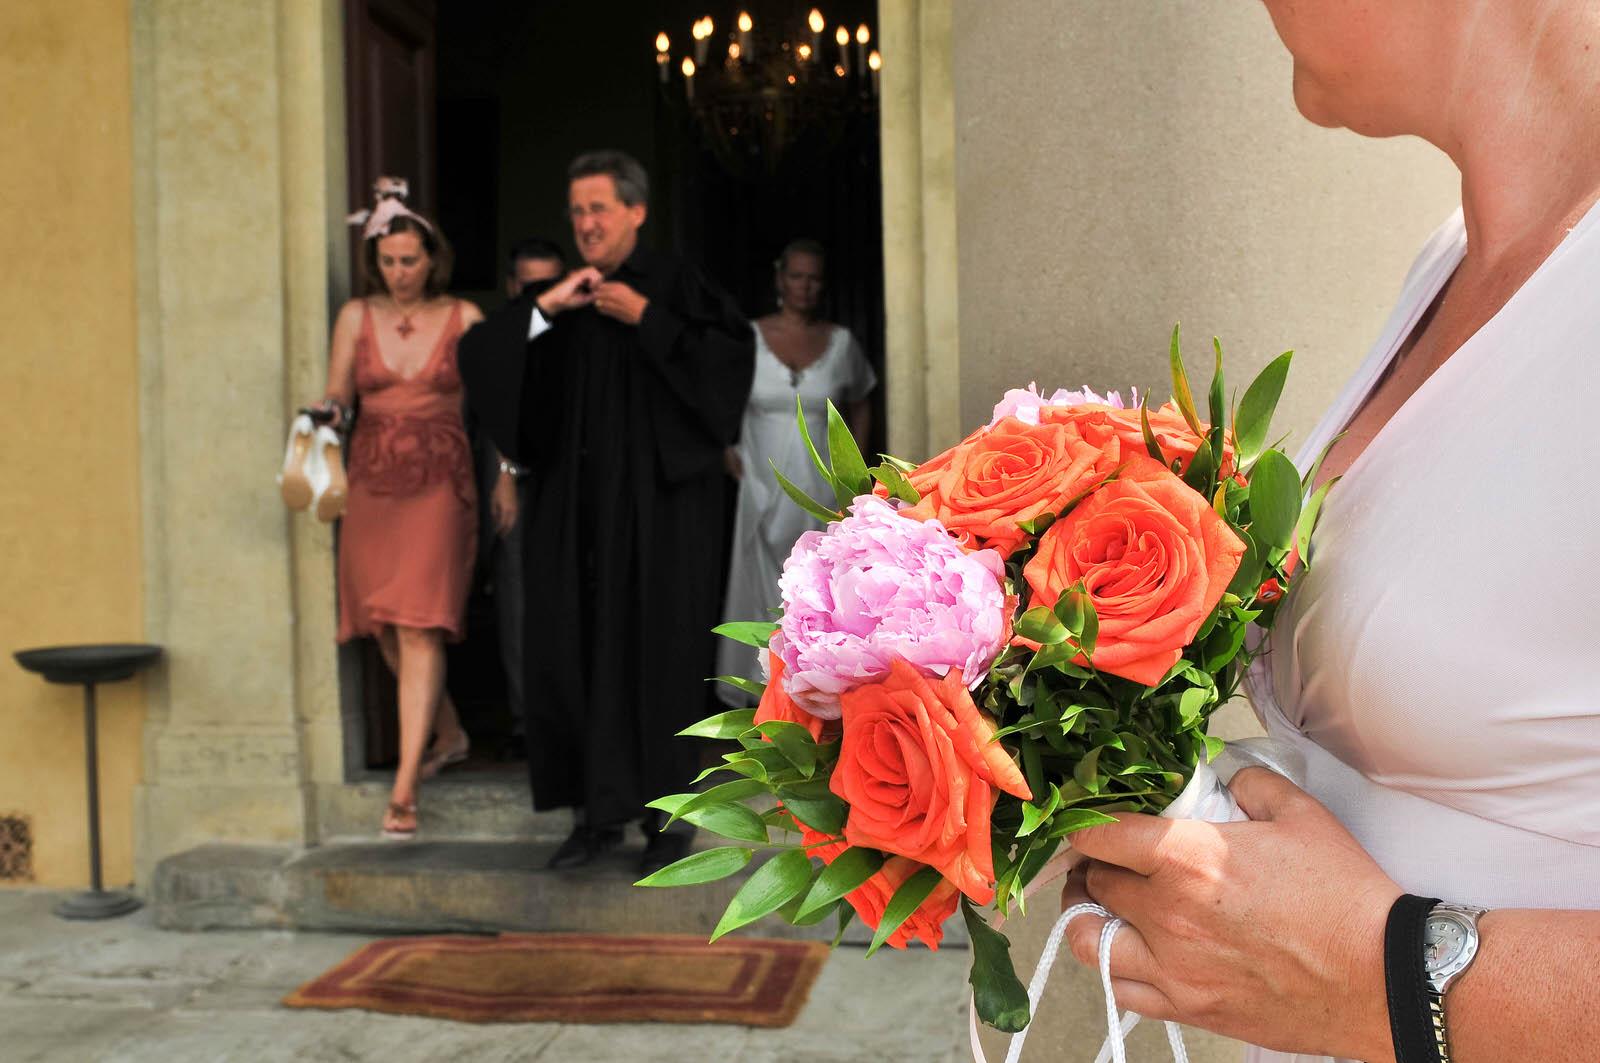 tuscany-wedding-planners-floristen-29.jpg